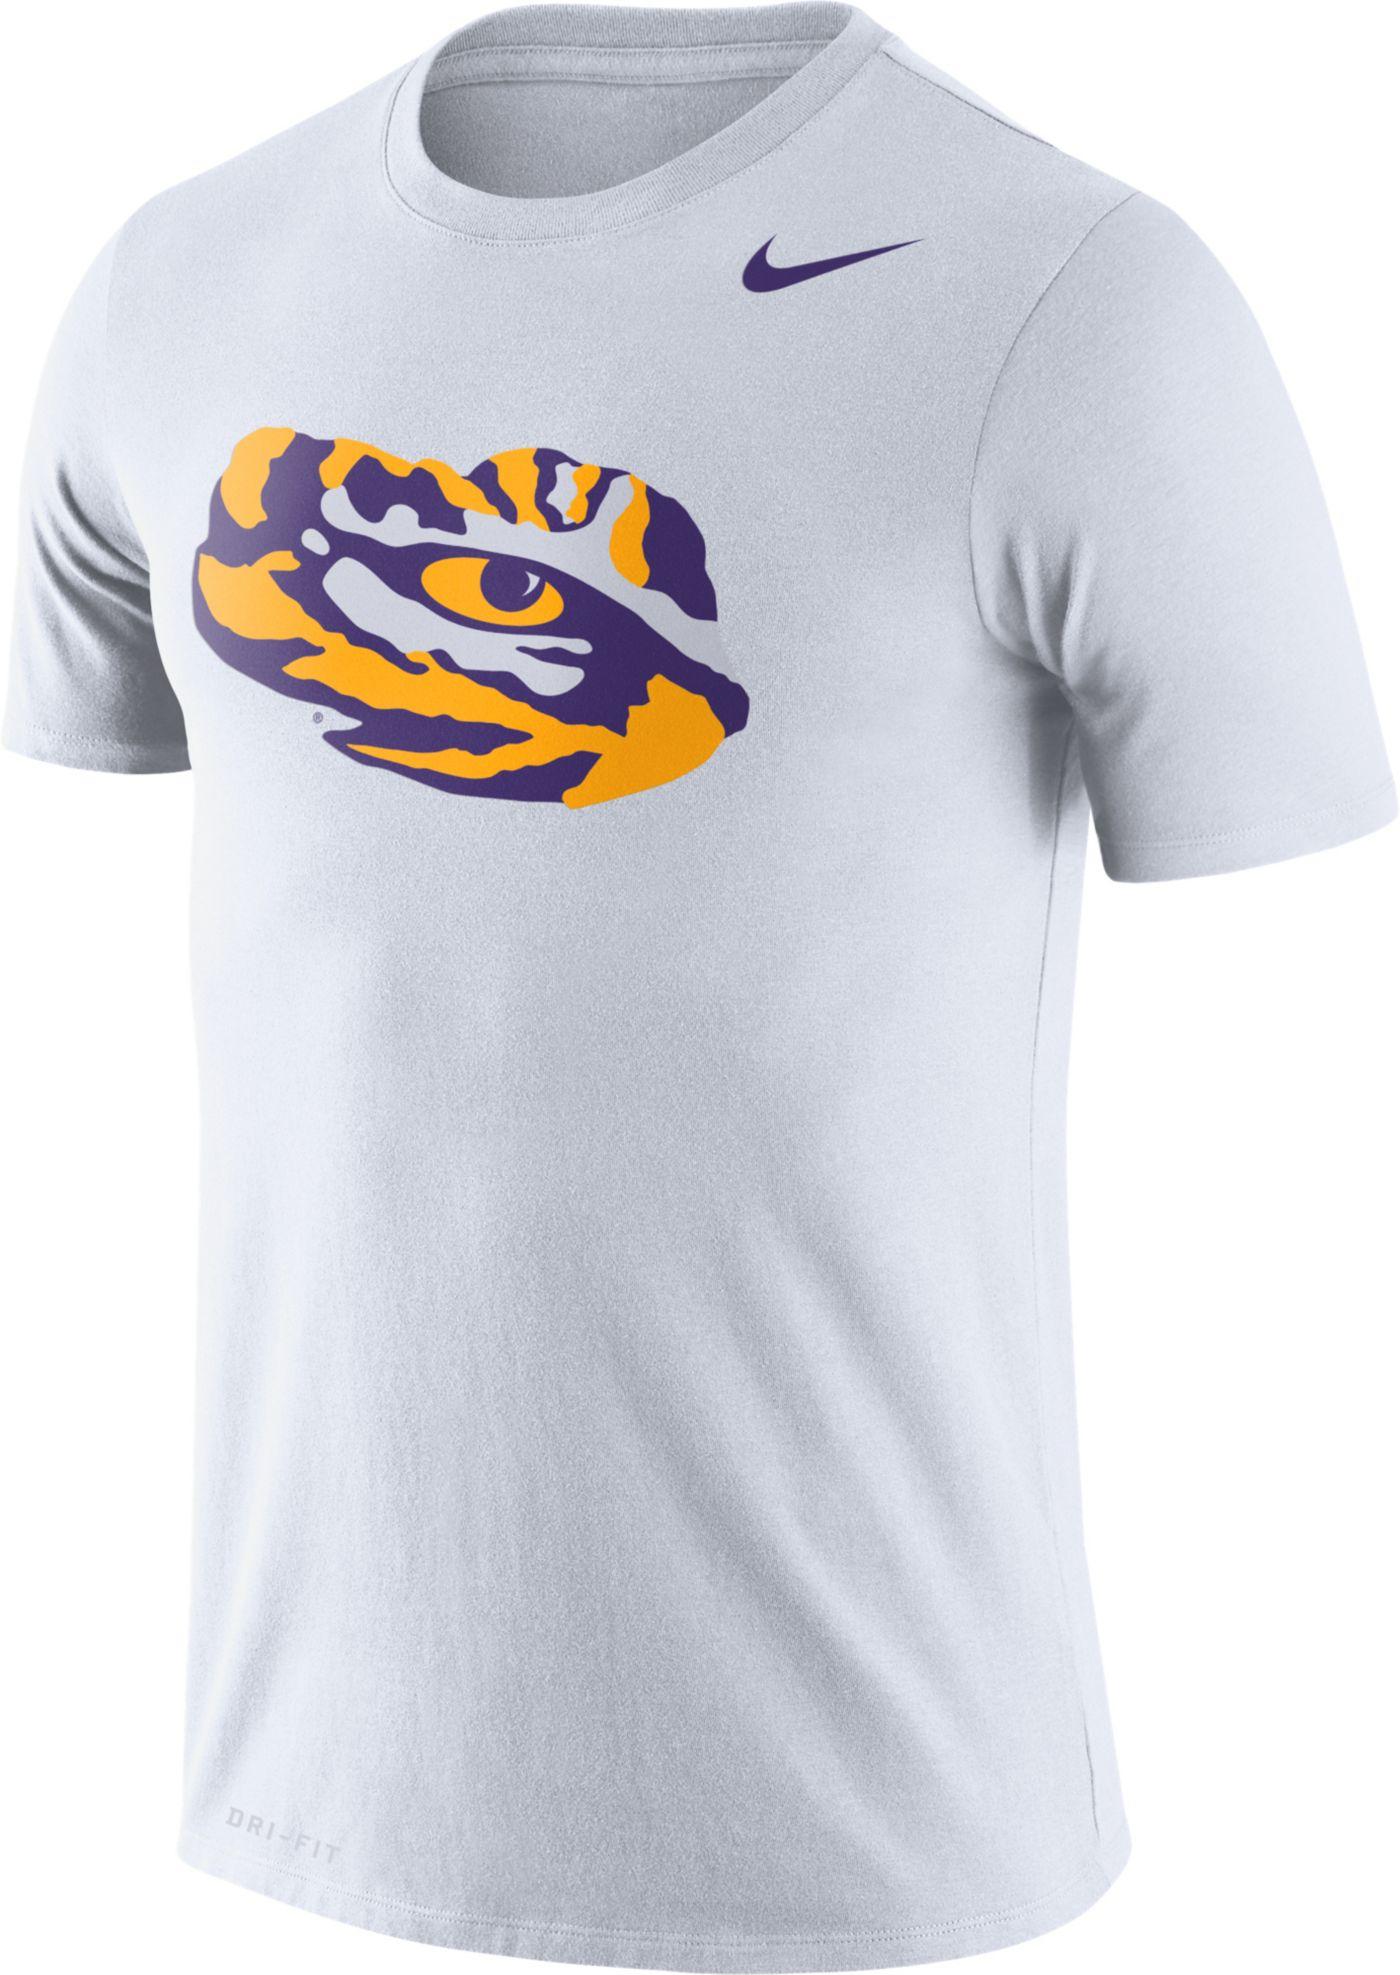 Nike Men's LSU Tigers Logo Dry Legend White T-Shirt